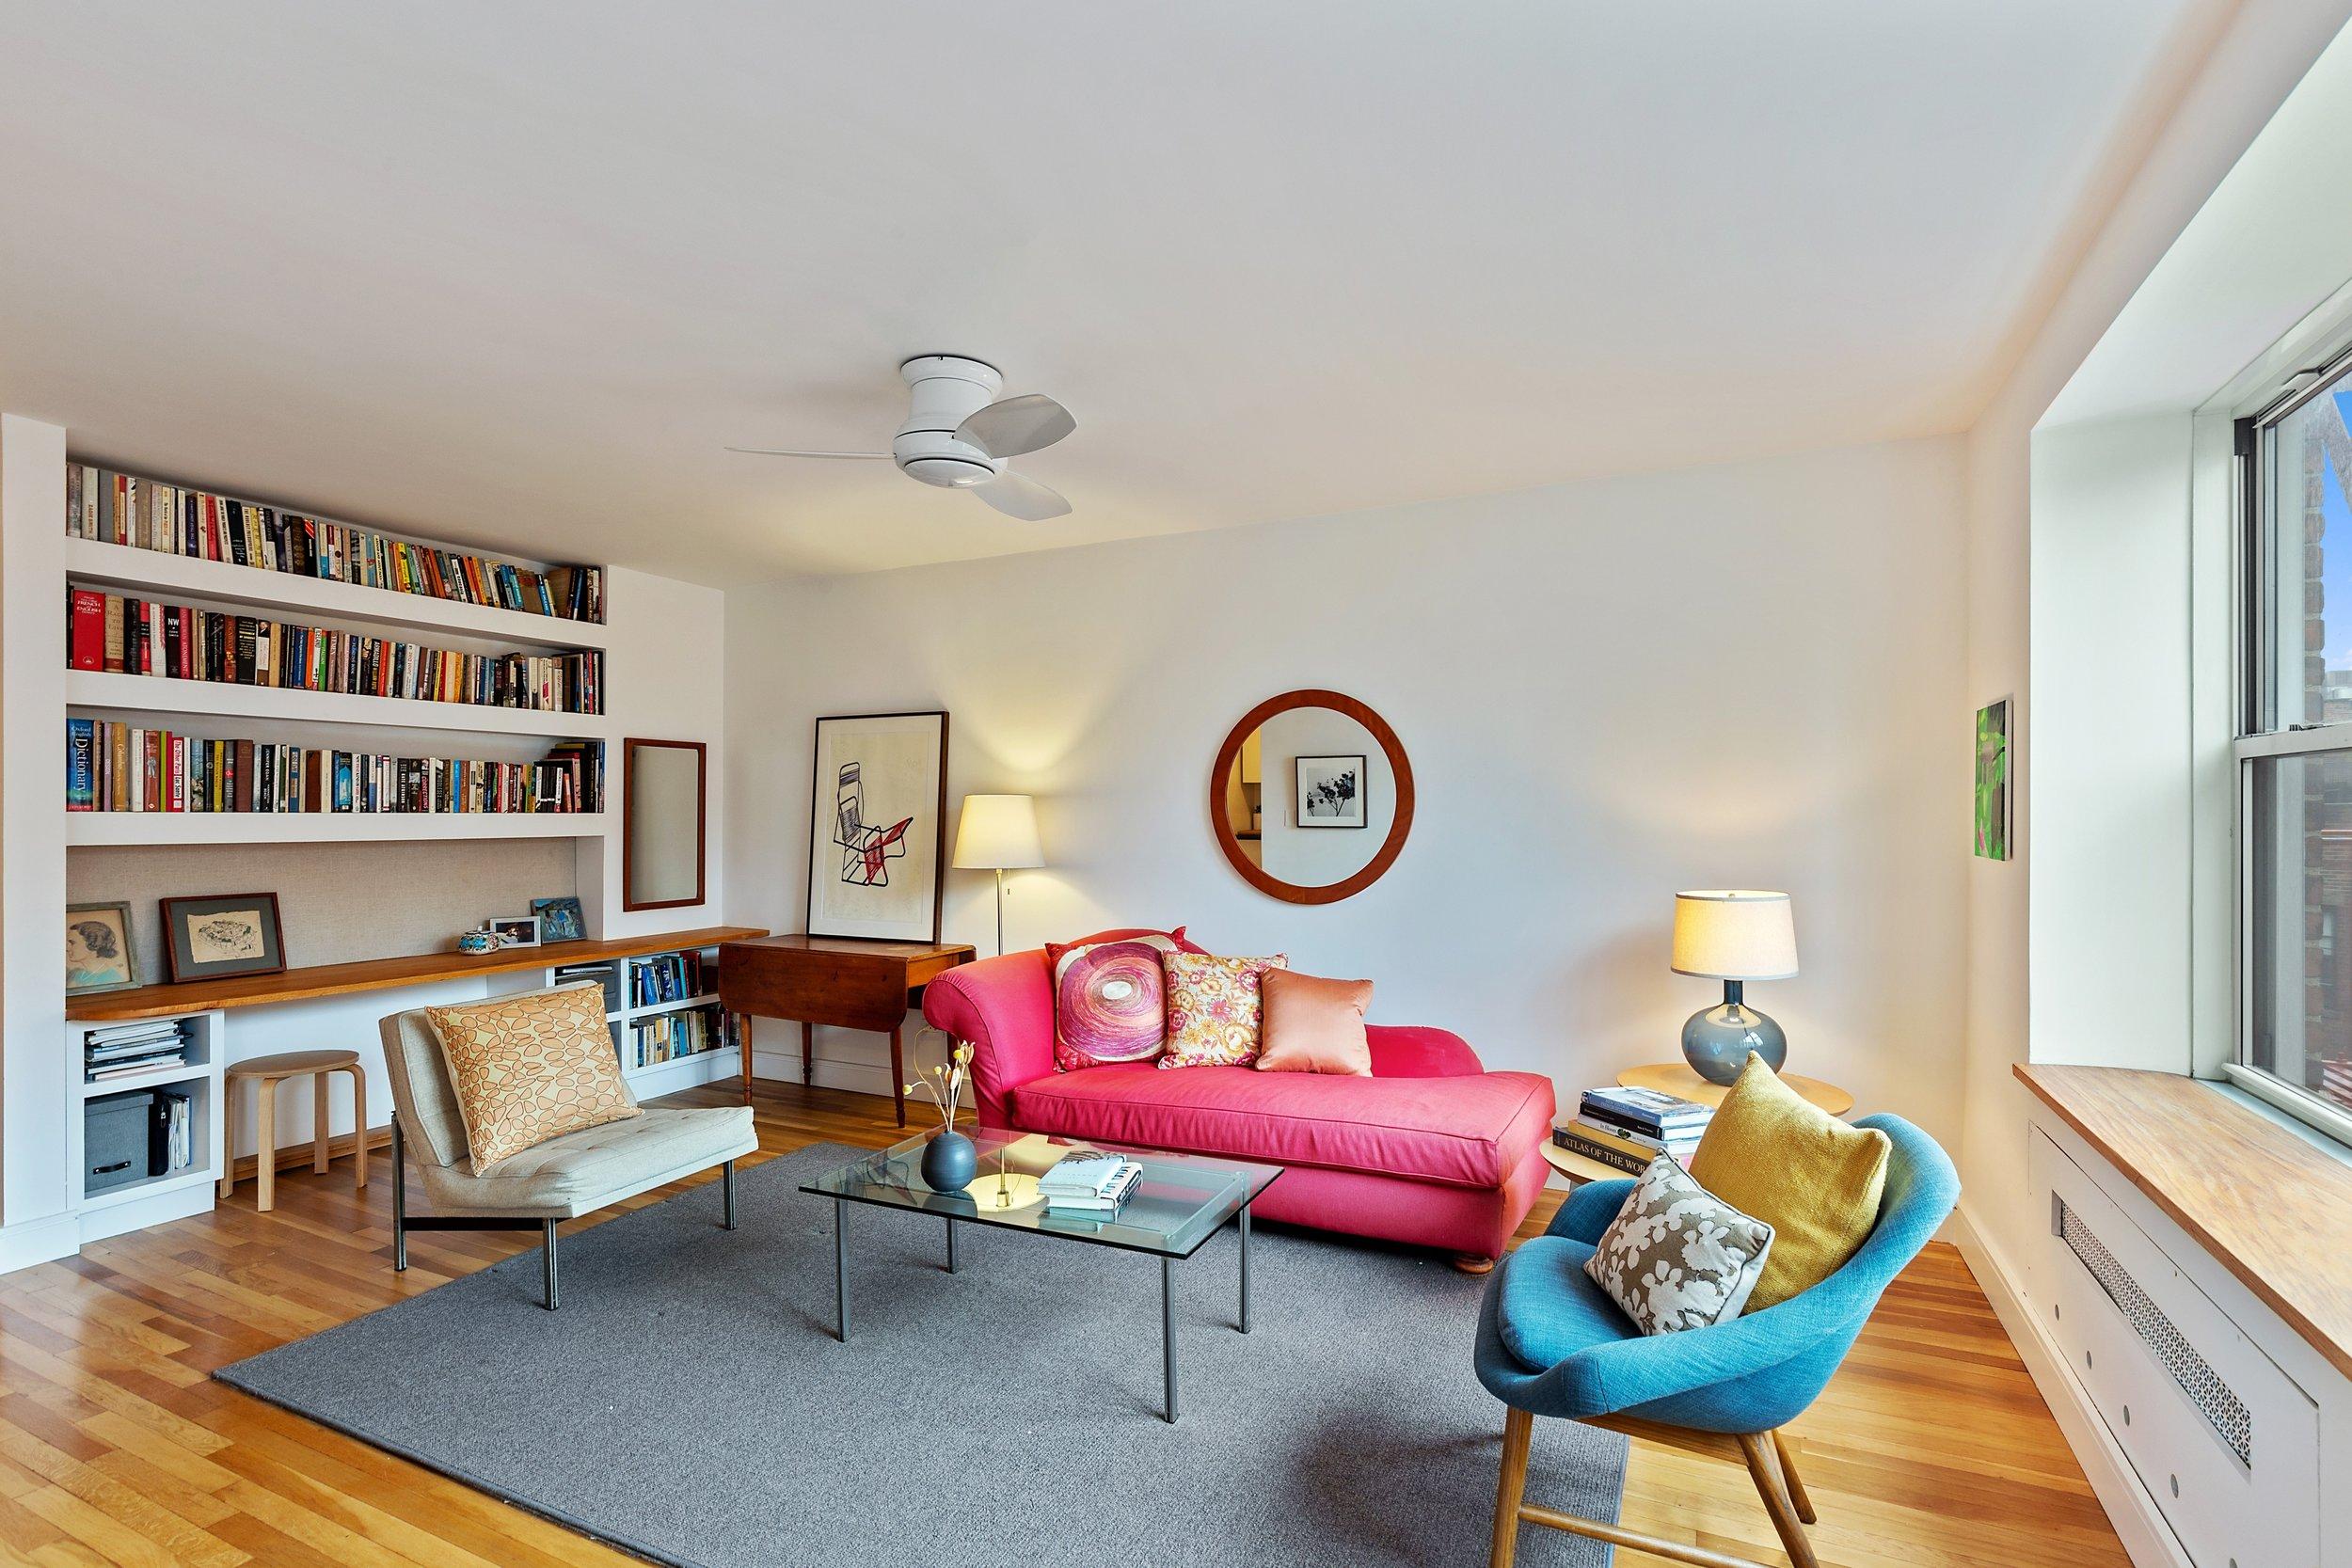 45 Grace Court - APT. 5E, Brooklyn Heights, bk